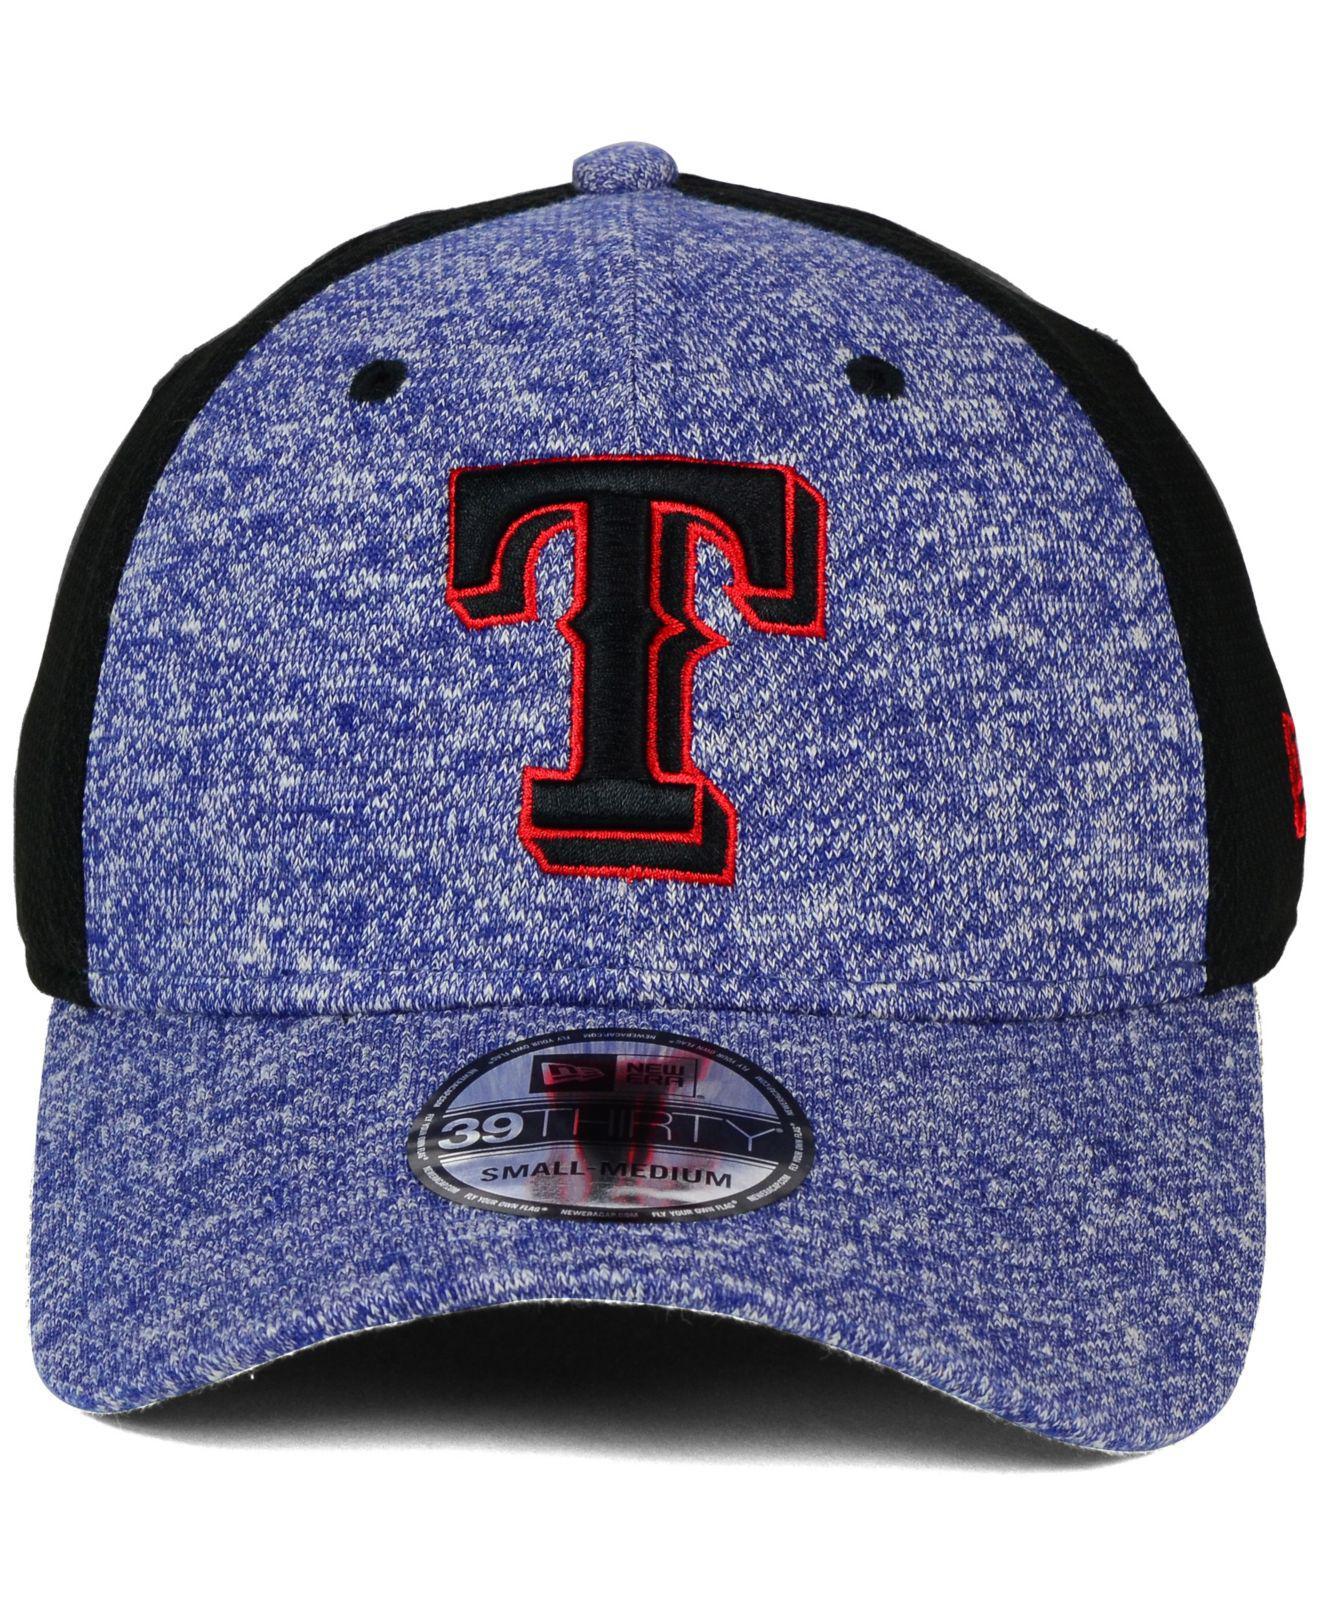 newest 6dff3 181ac ... discount lyst ktz texas rangers tech fuse 39thirty cap in blue for men  9cf81 ec260